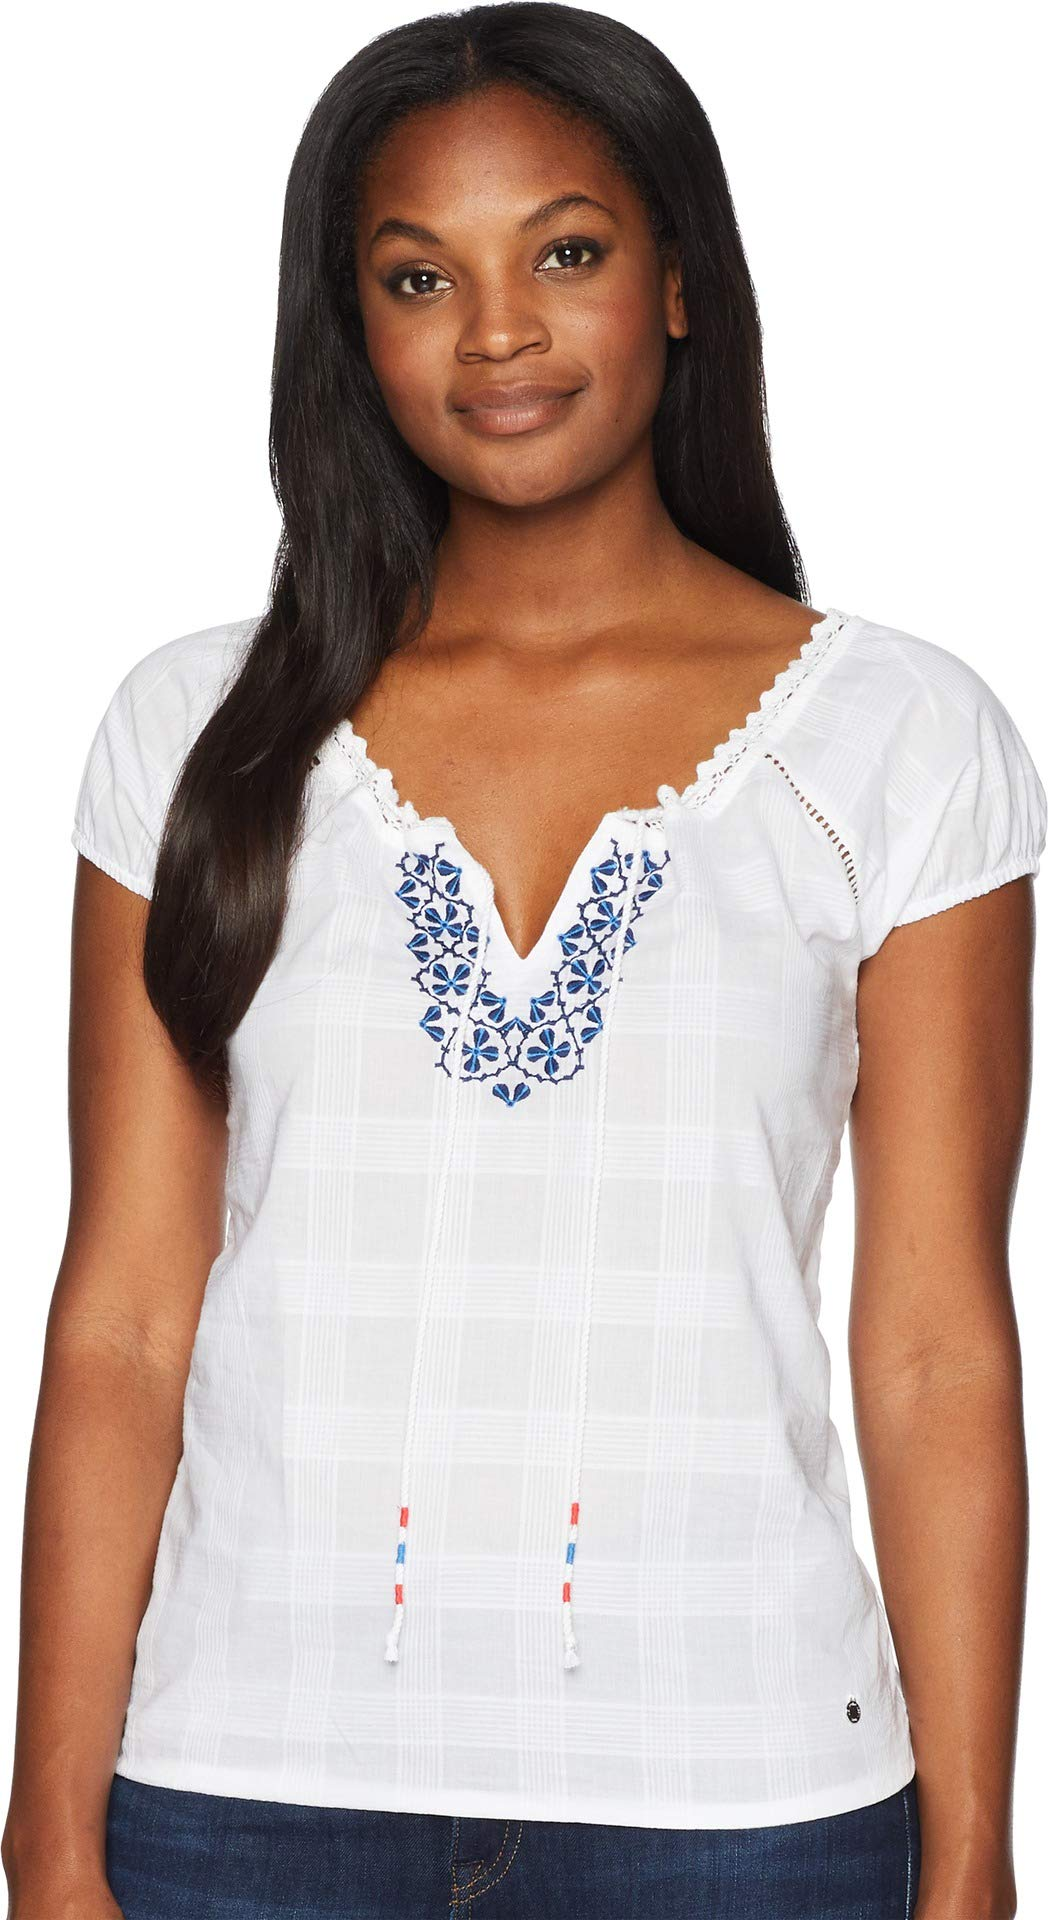 U.S. Polo Assn. Women's Short Sleeve Fashion Blouse, Optic White-Fgll, S by U.S. Polo Assn.